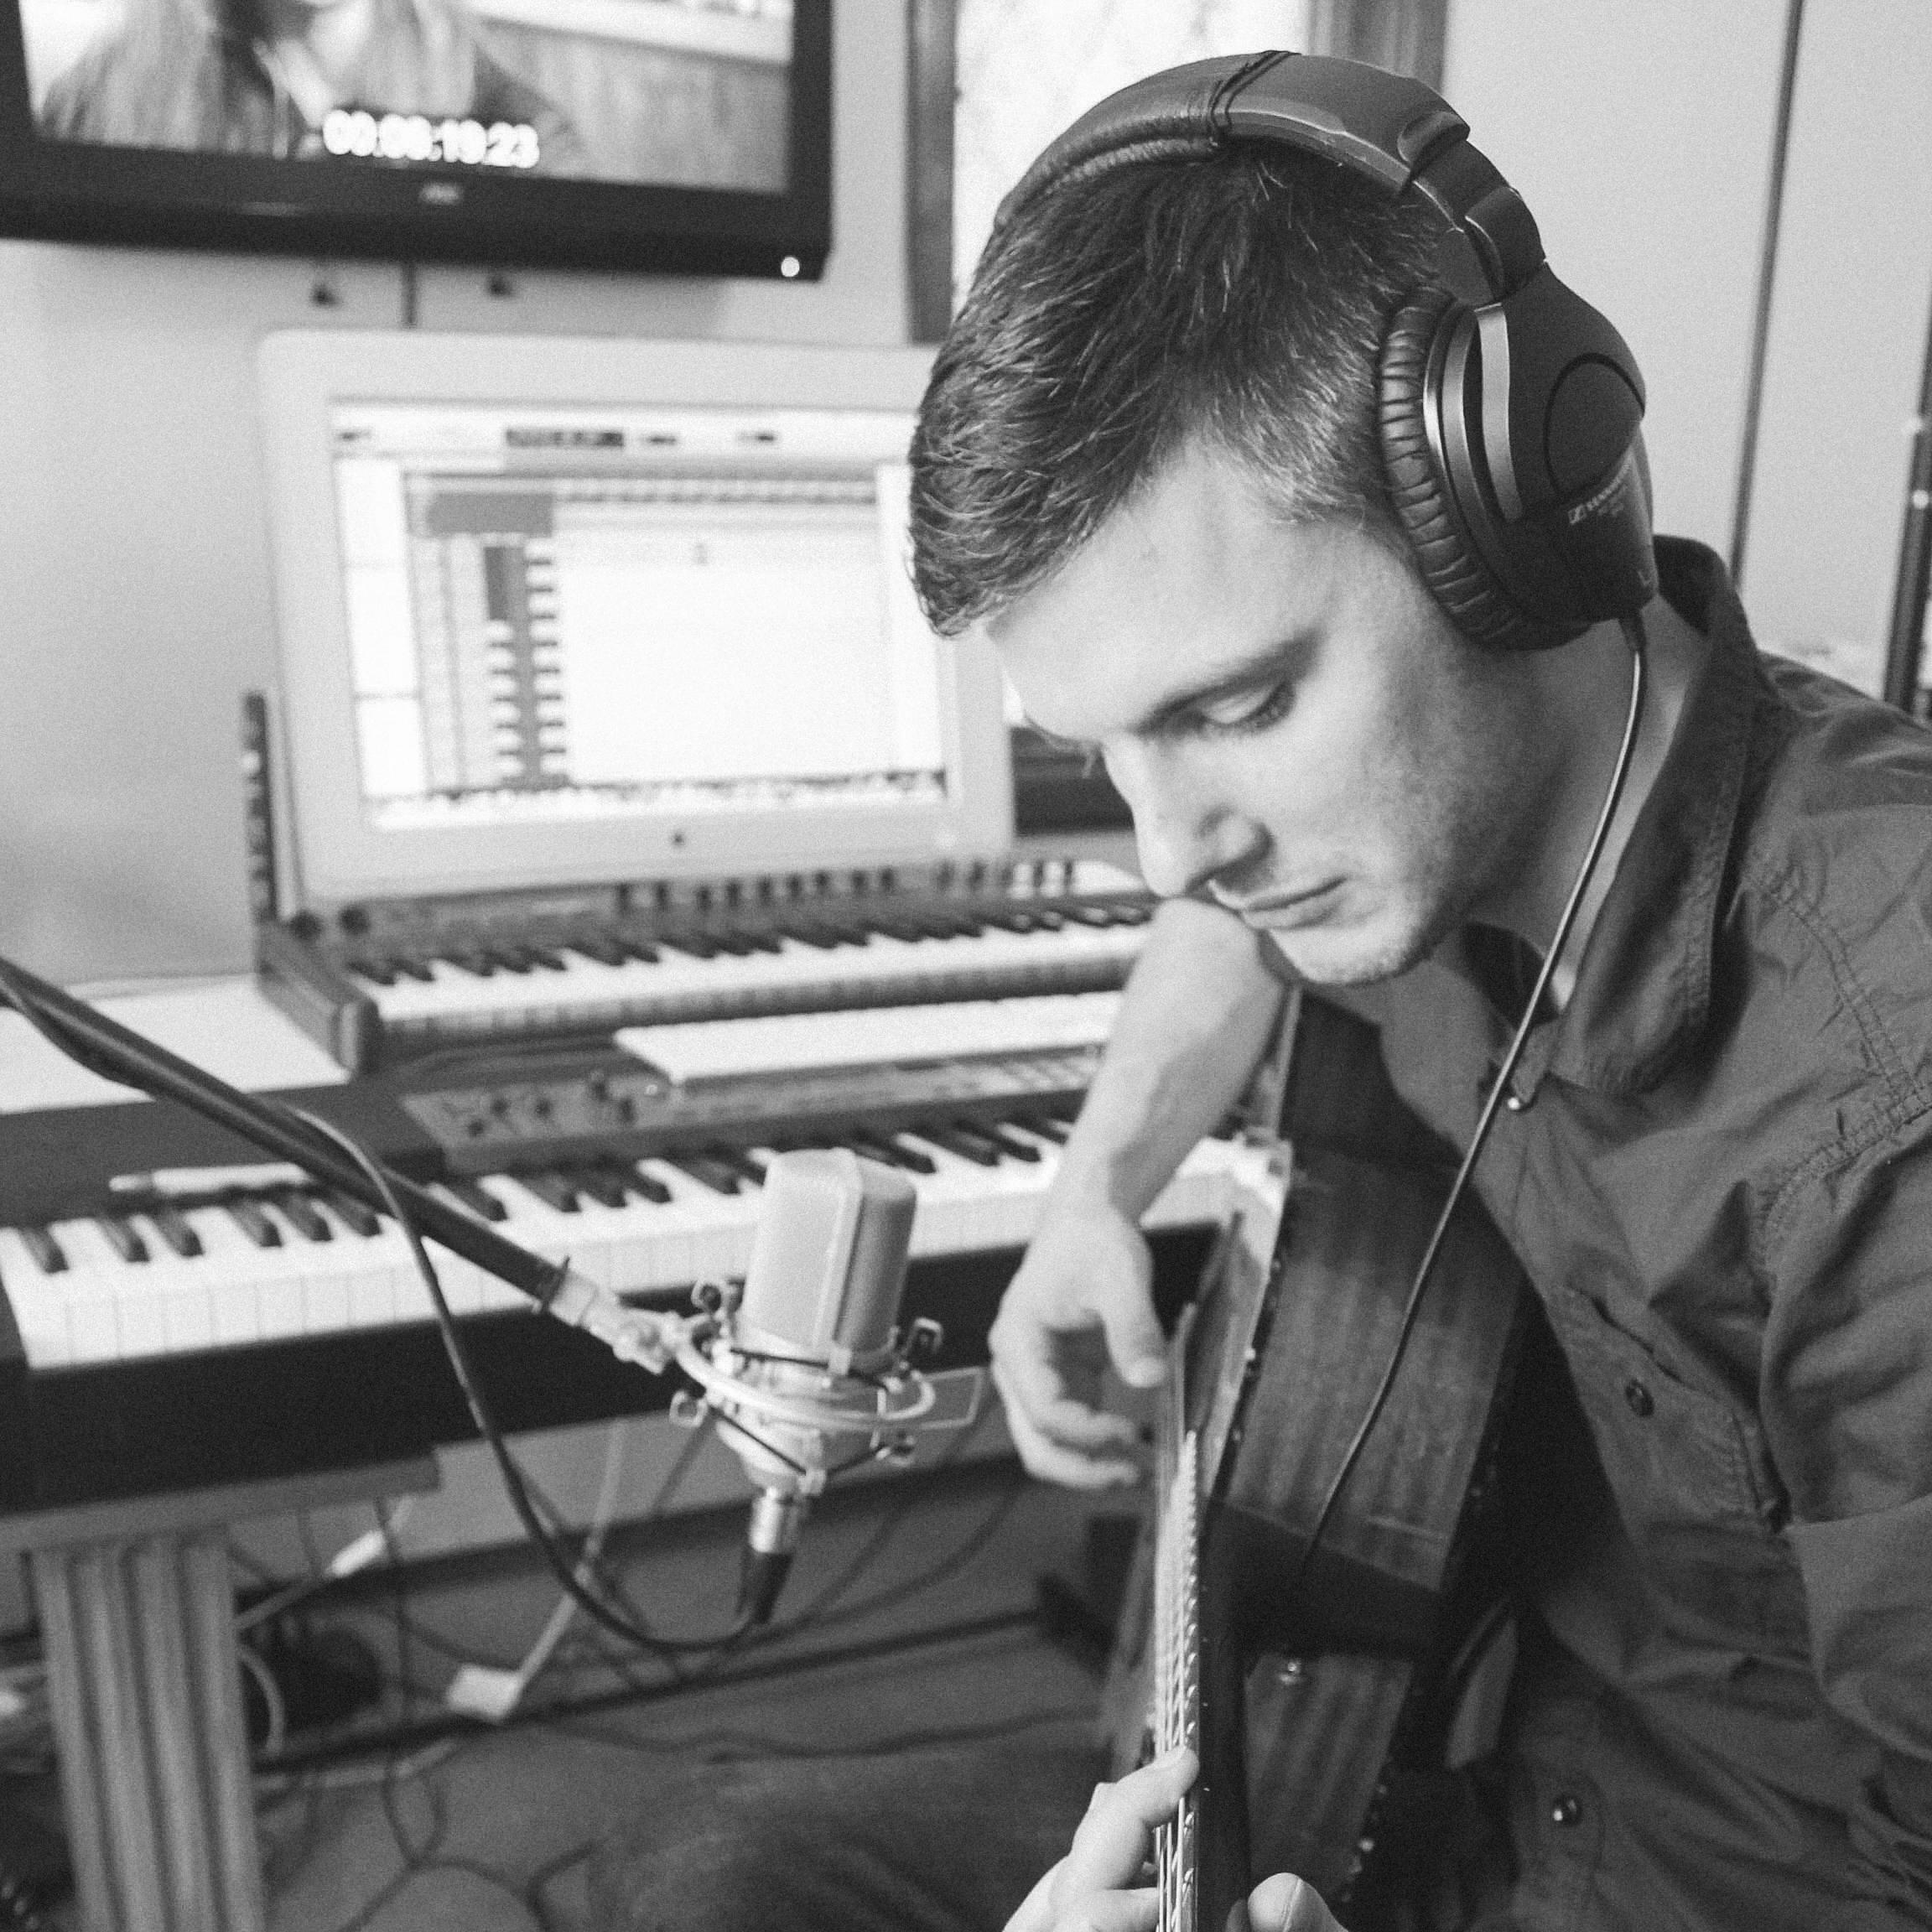 Composer - Justin Michael Brittian